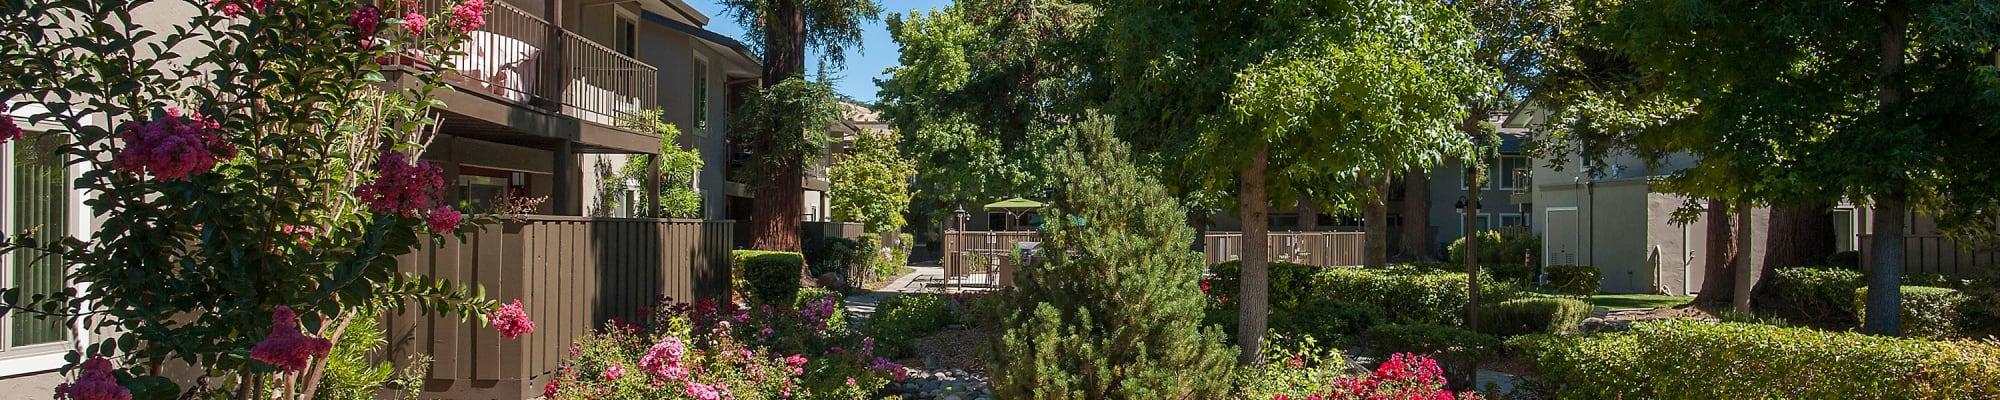 Resident perks at Flora Condominium Rentals in Walnut Creek, California